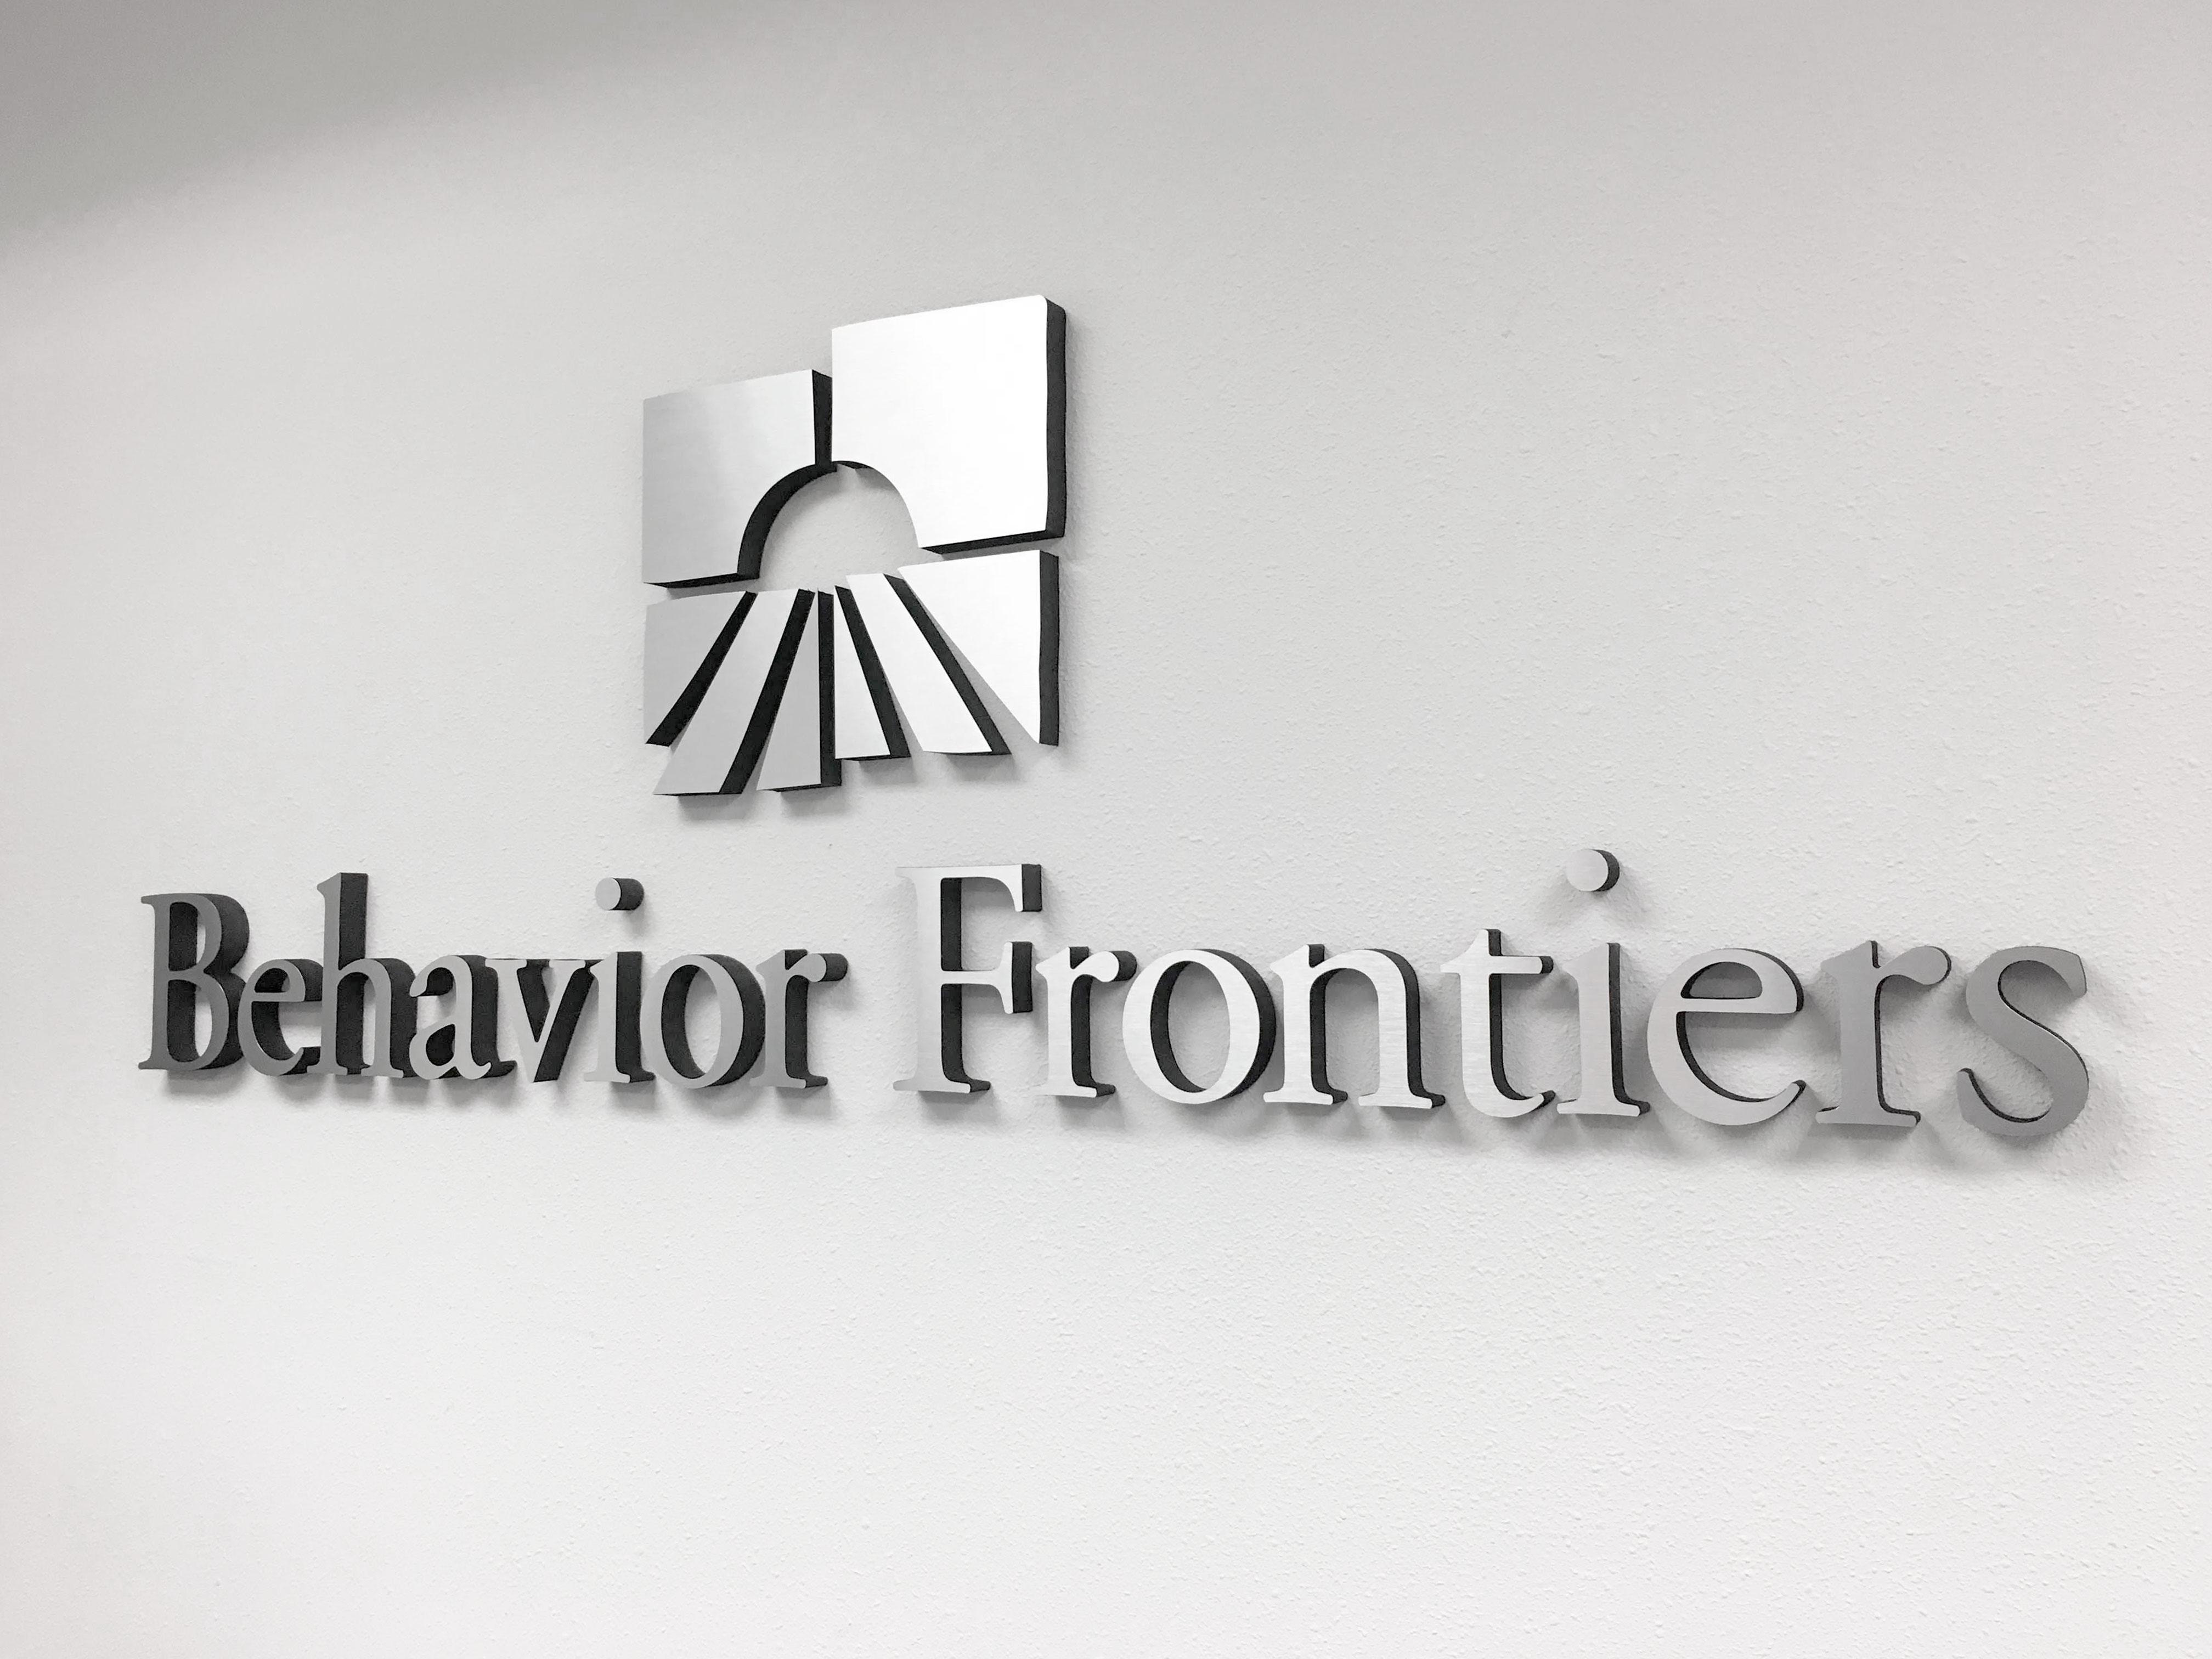 behaviorfrontierslobbysignwebsite.jpg